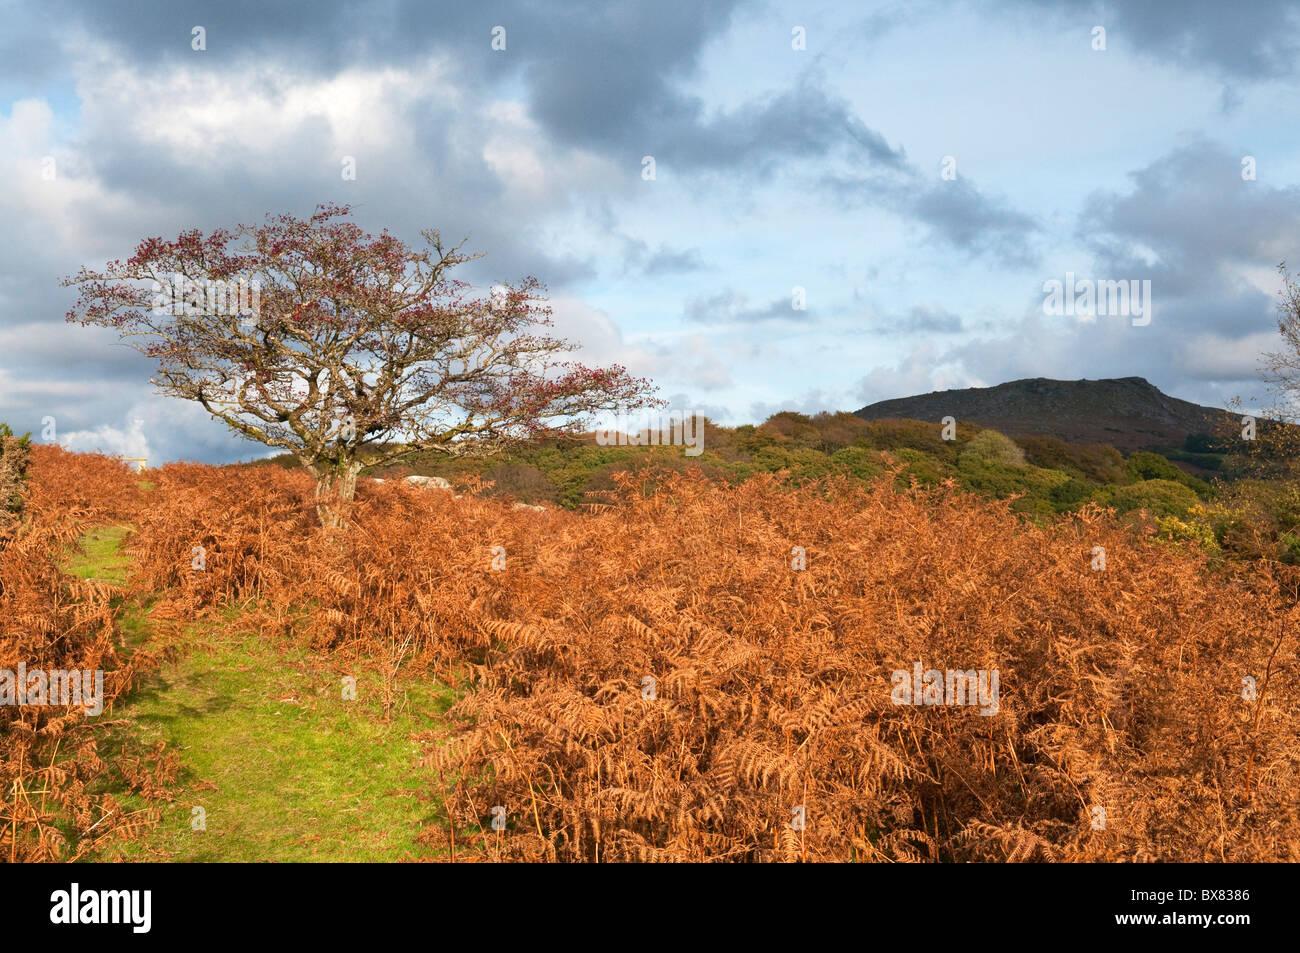 Russet red bracken and hawthorn tree in autumn on Dartmoor, Devon UK - Stock Image